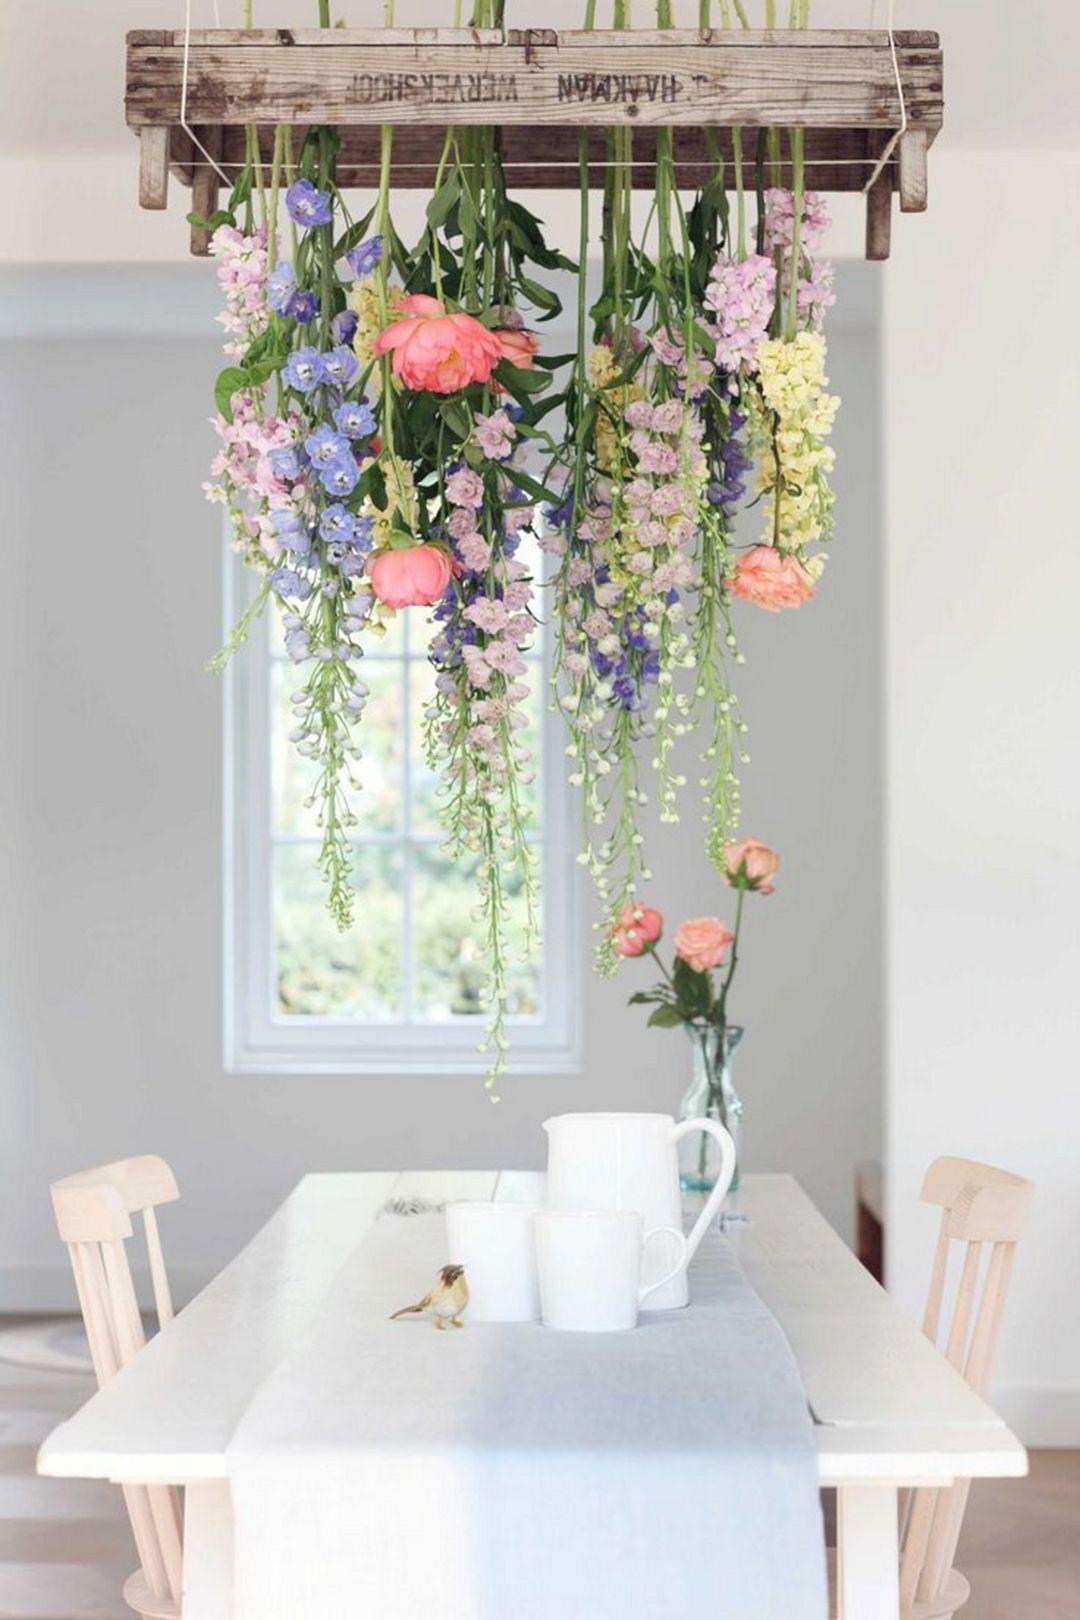 Diy Rustic Home Decor Ideas cheap and